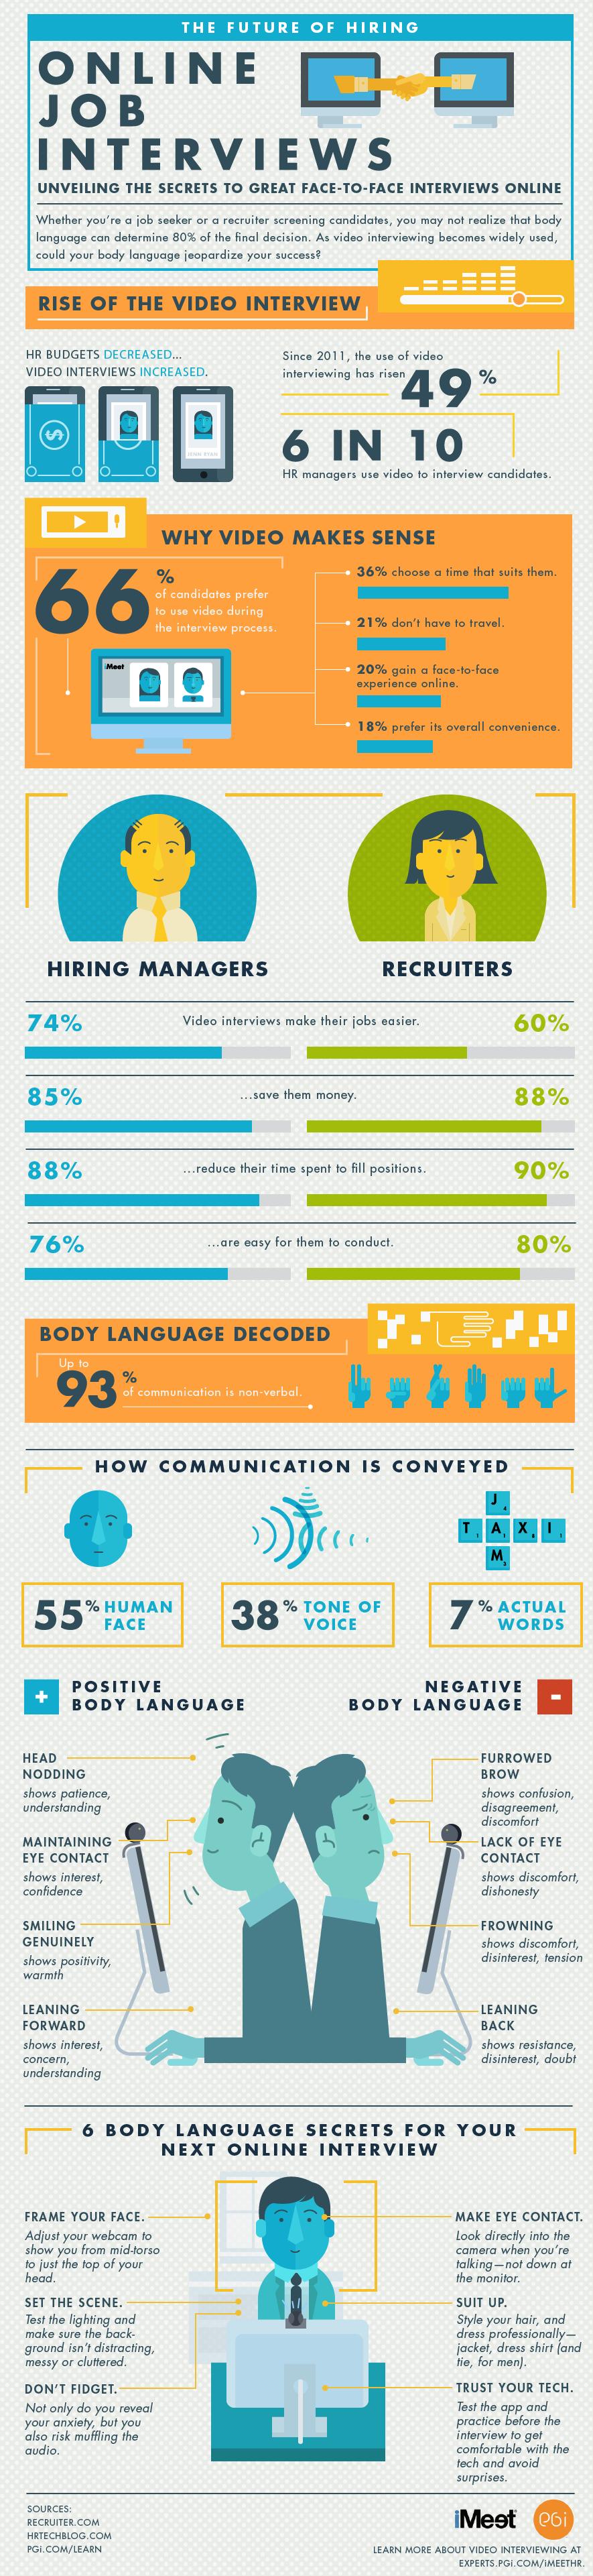 Infographic: Online Job Interviews